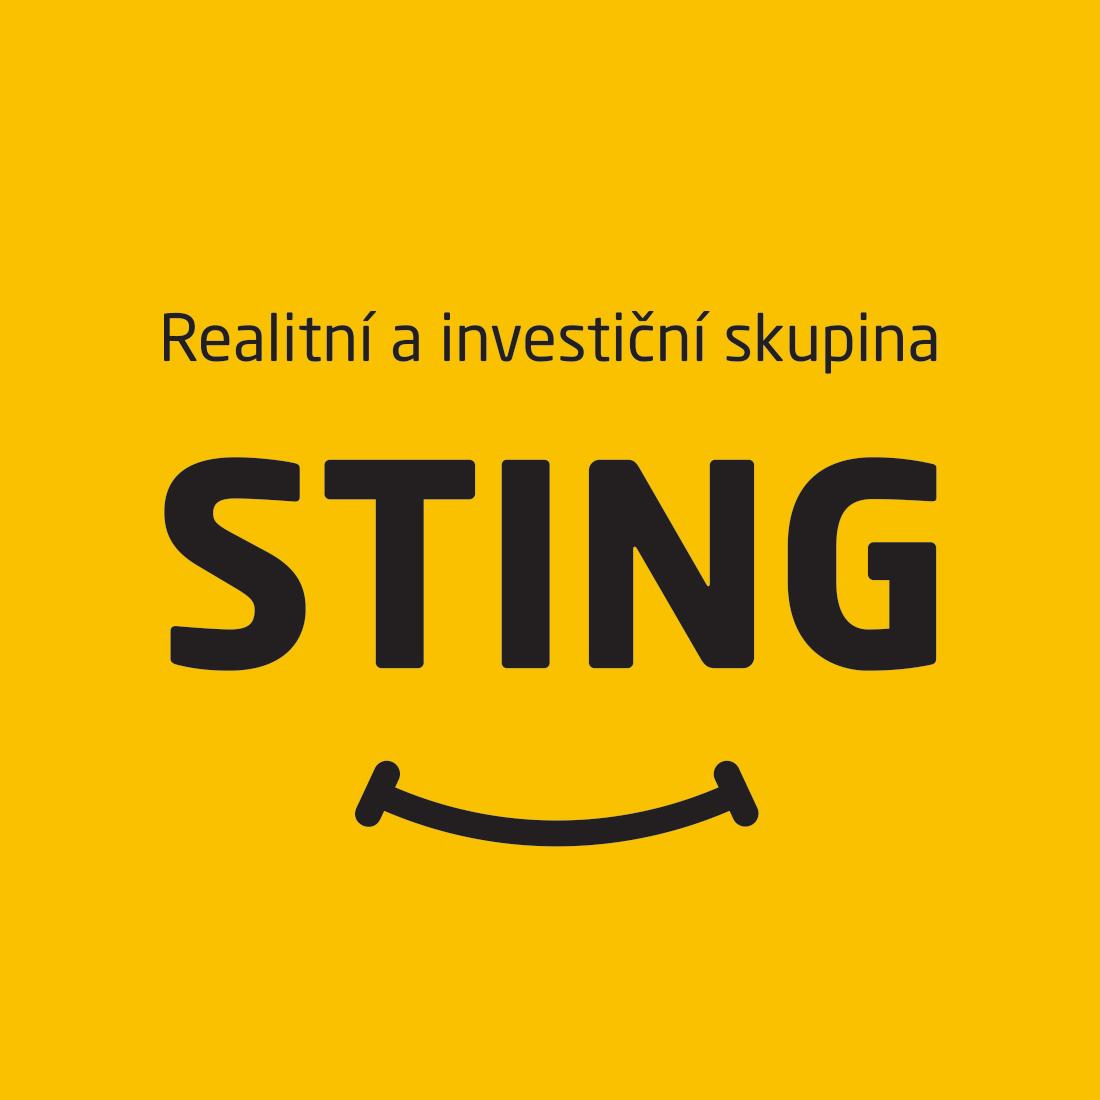 sting-logo